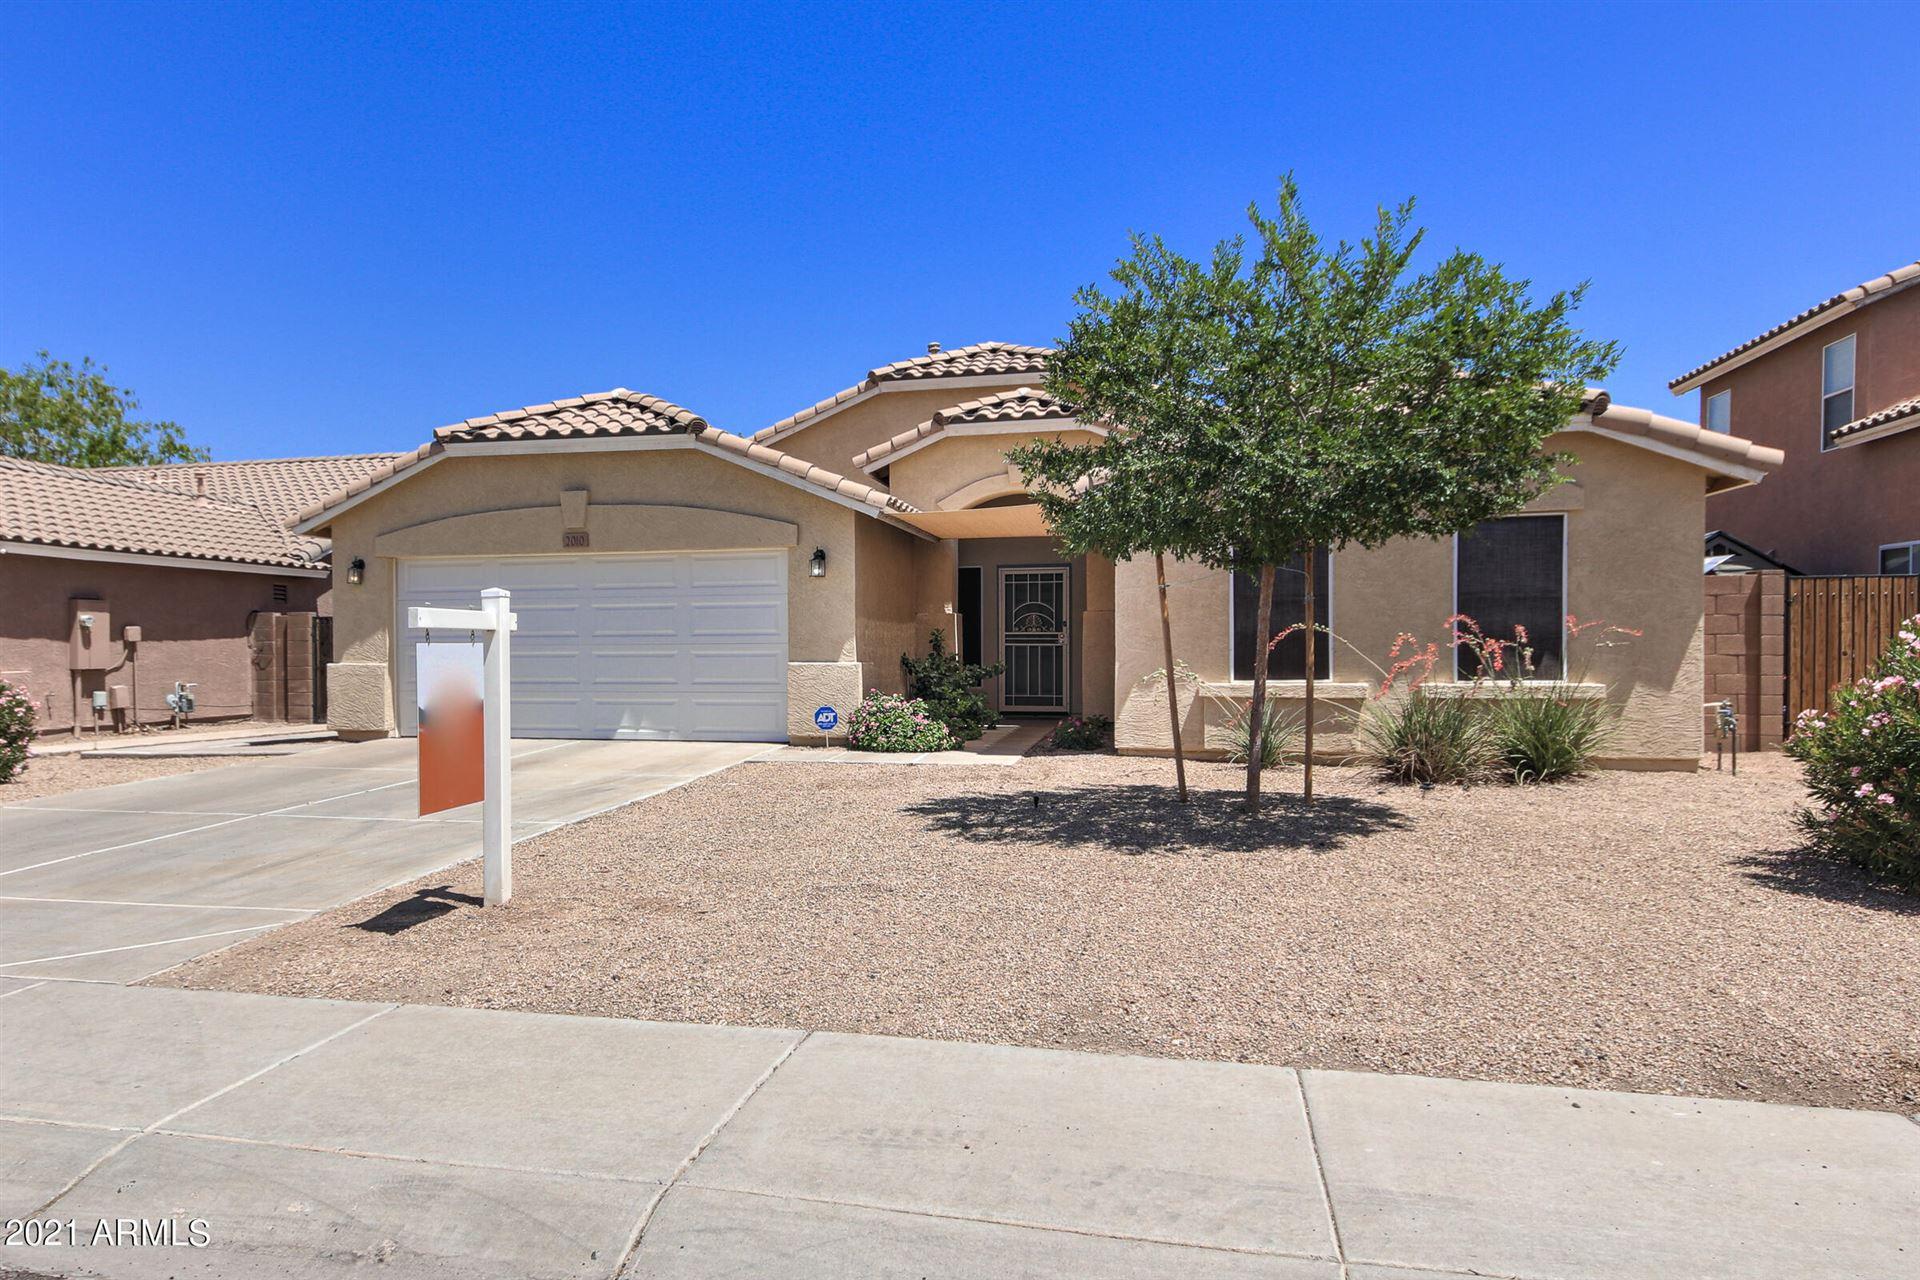 2010 W ALTA VISTA Road, Phoenix, AZ 85041 - MLS#: 6248582